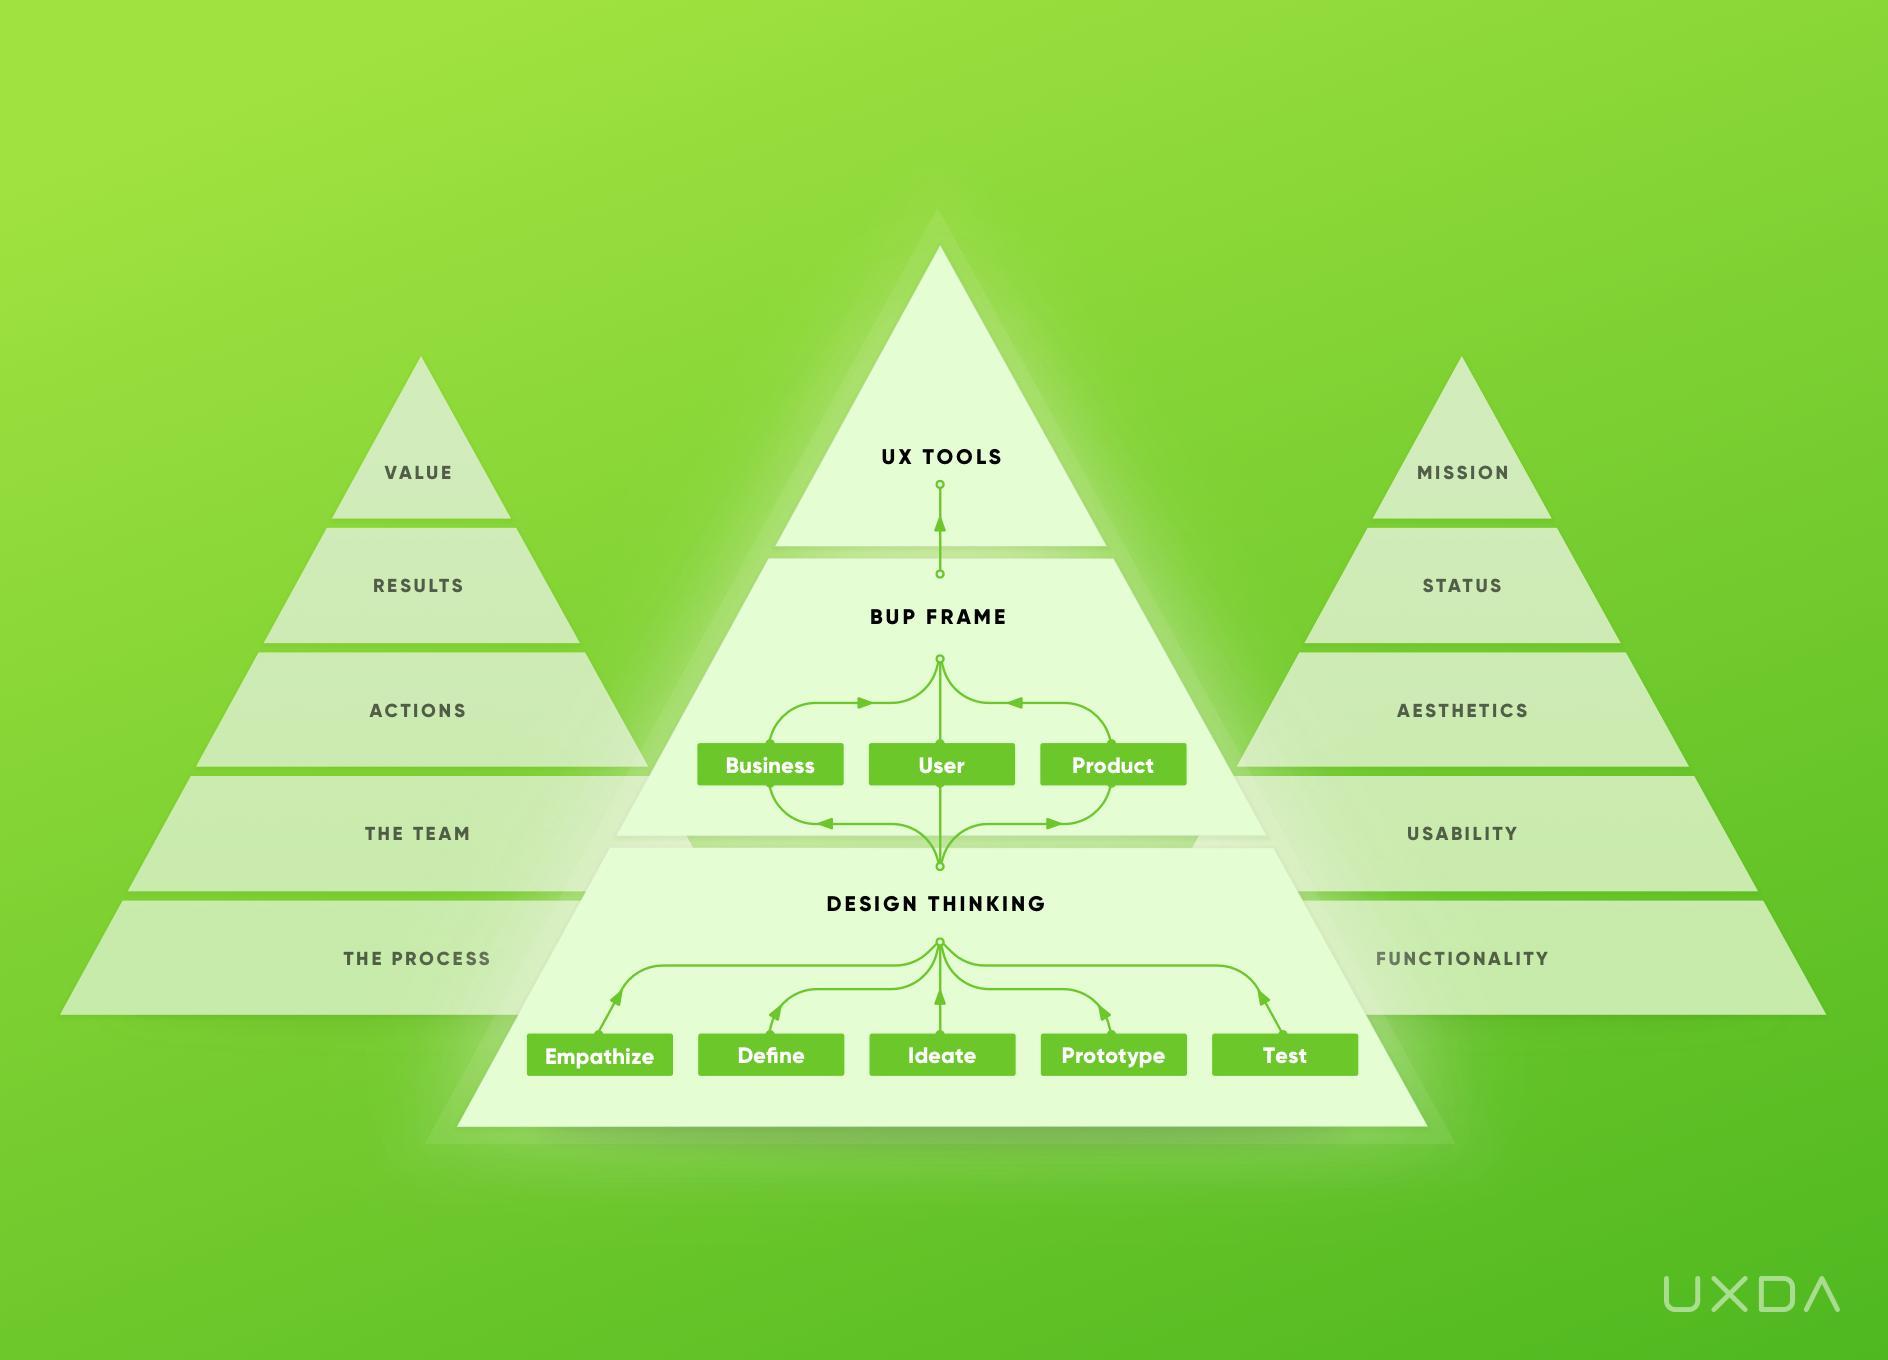 financial-ux-design-methodology-1.jpg